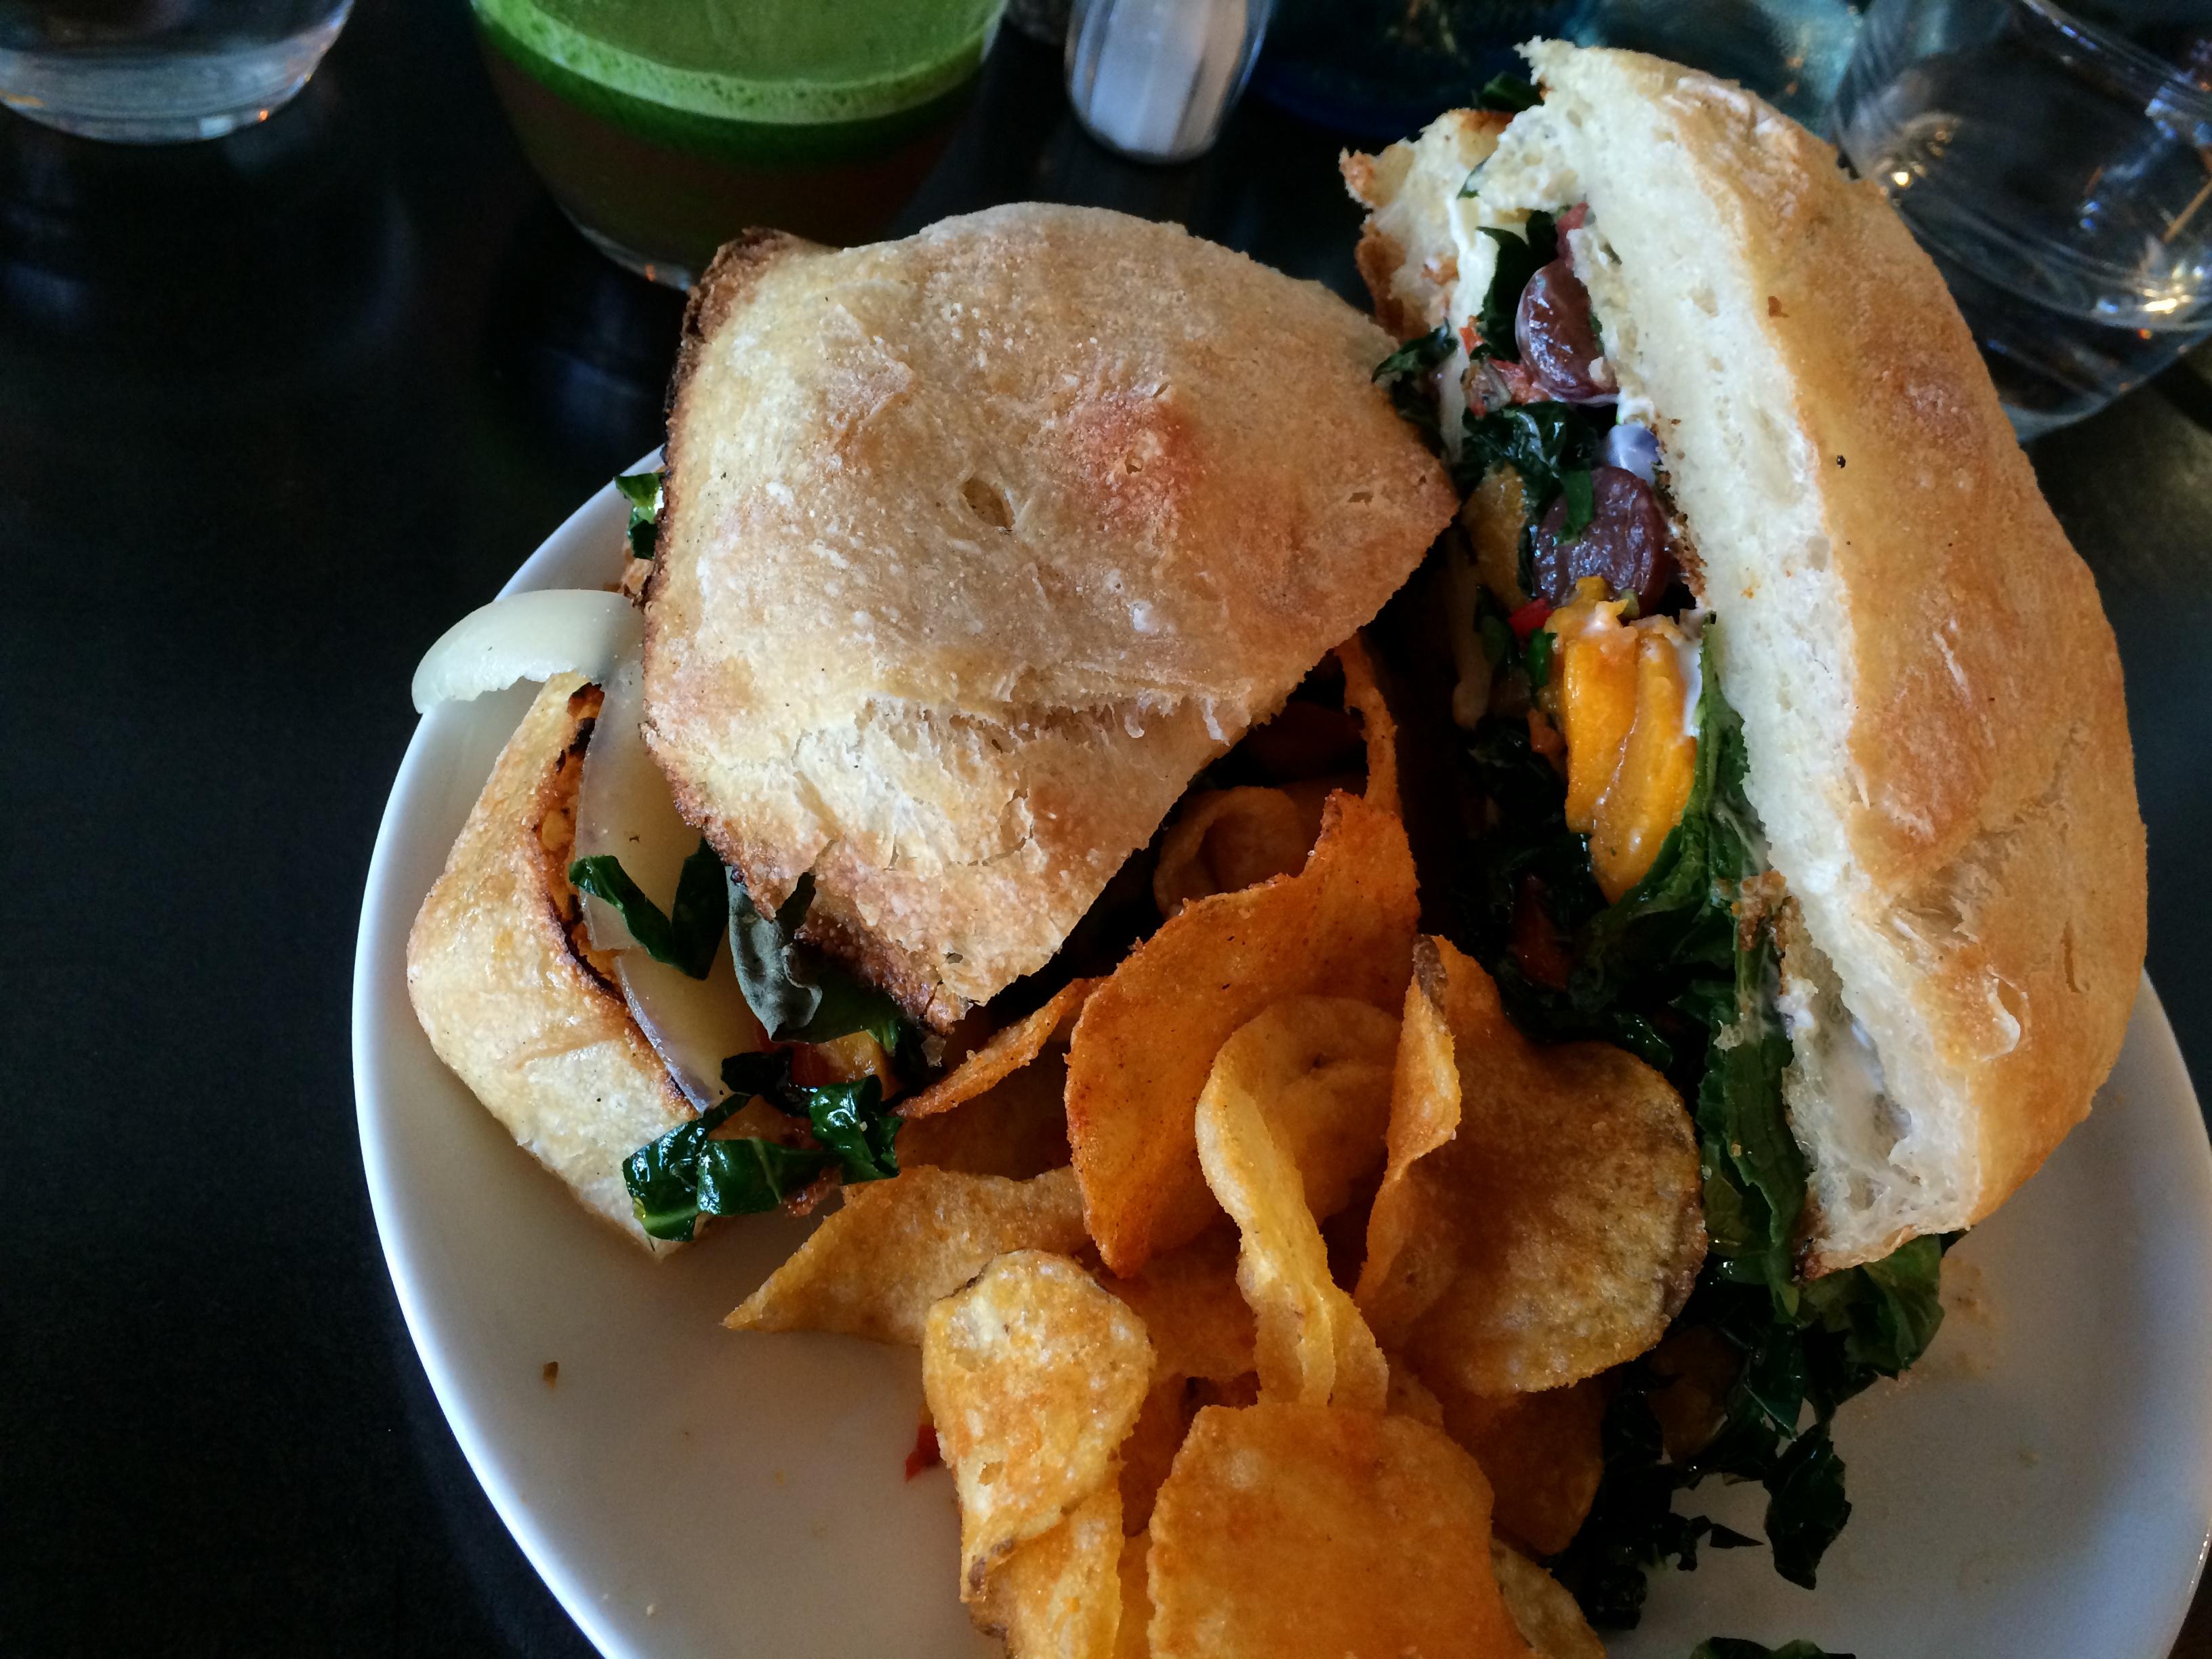 Butternut squash sandwich